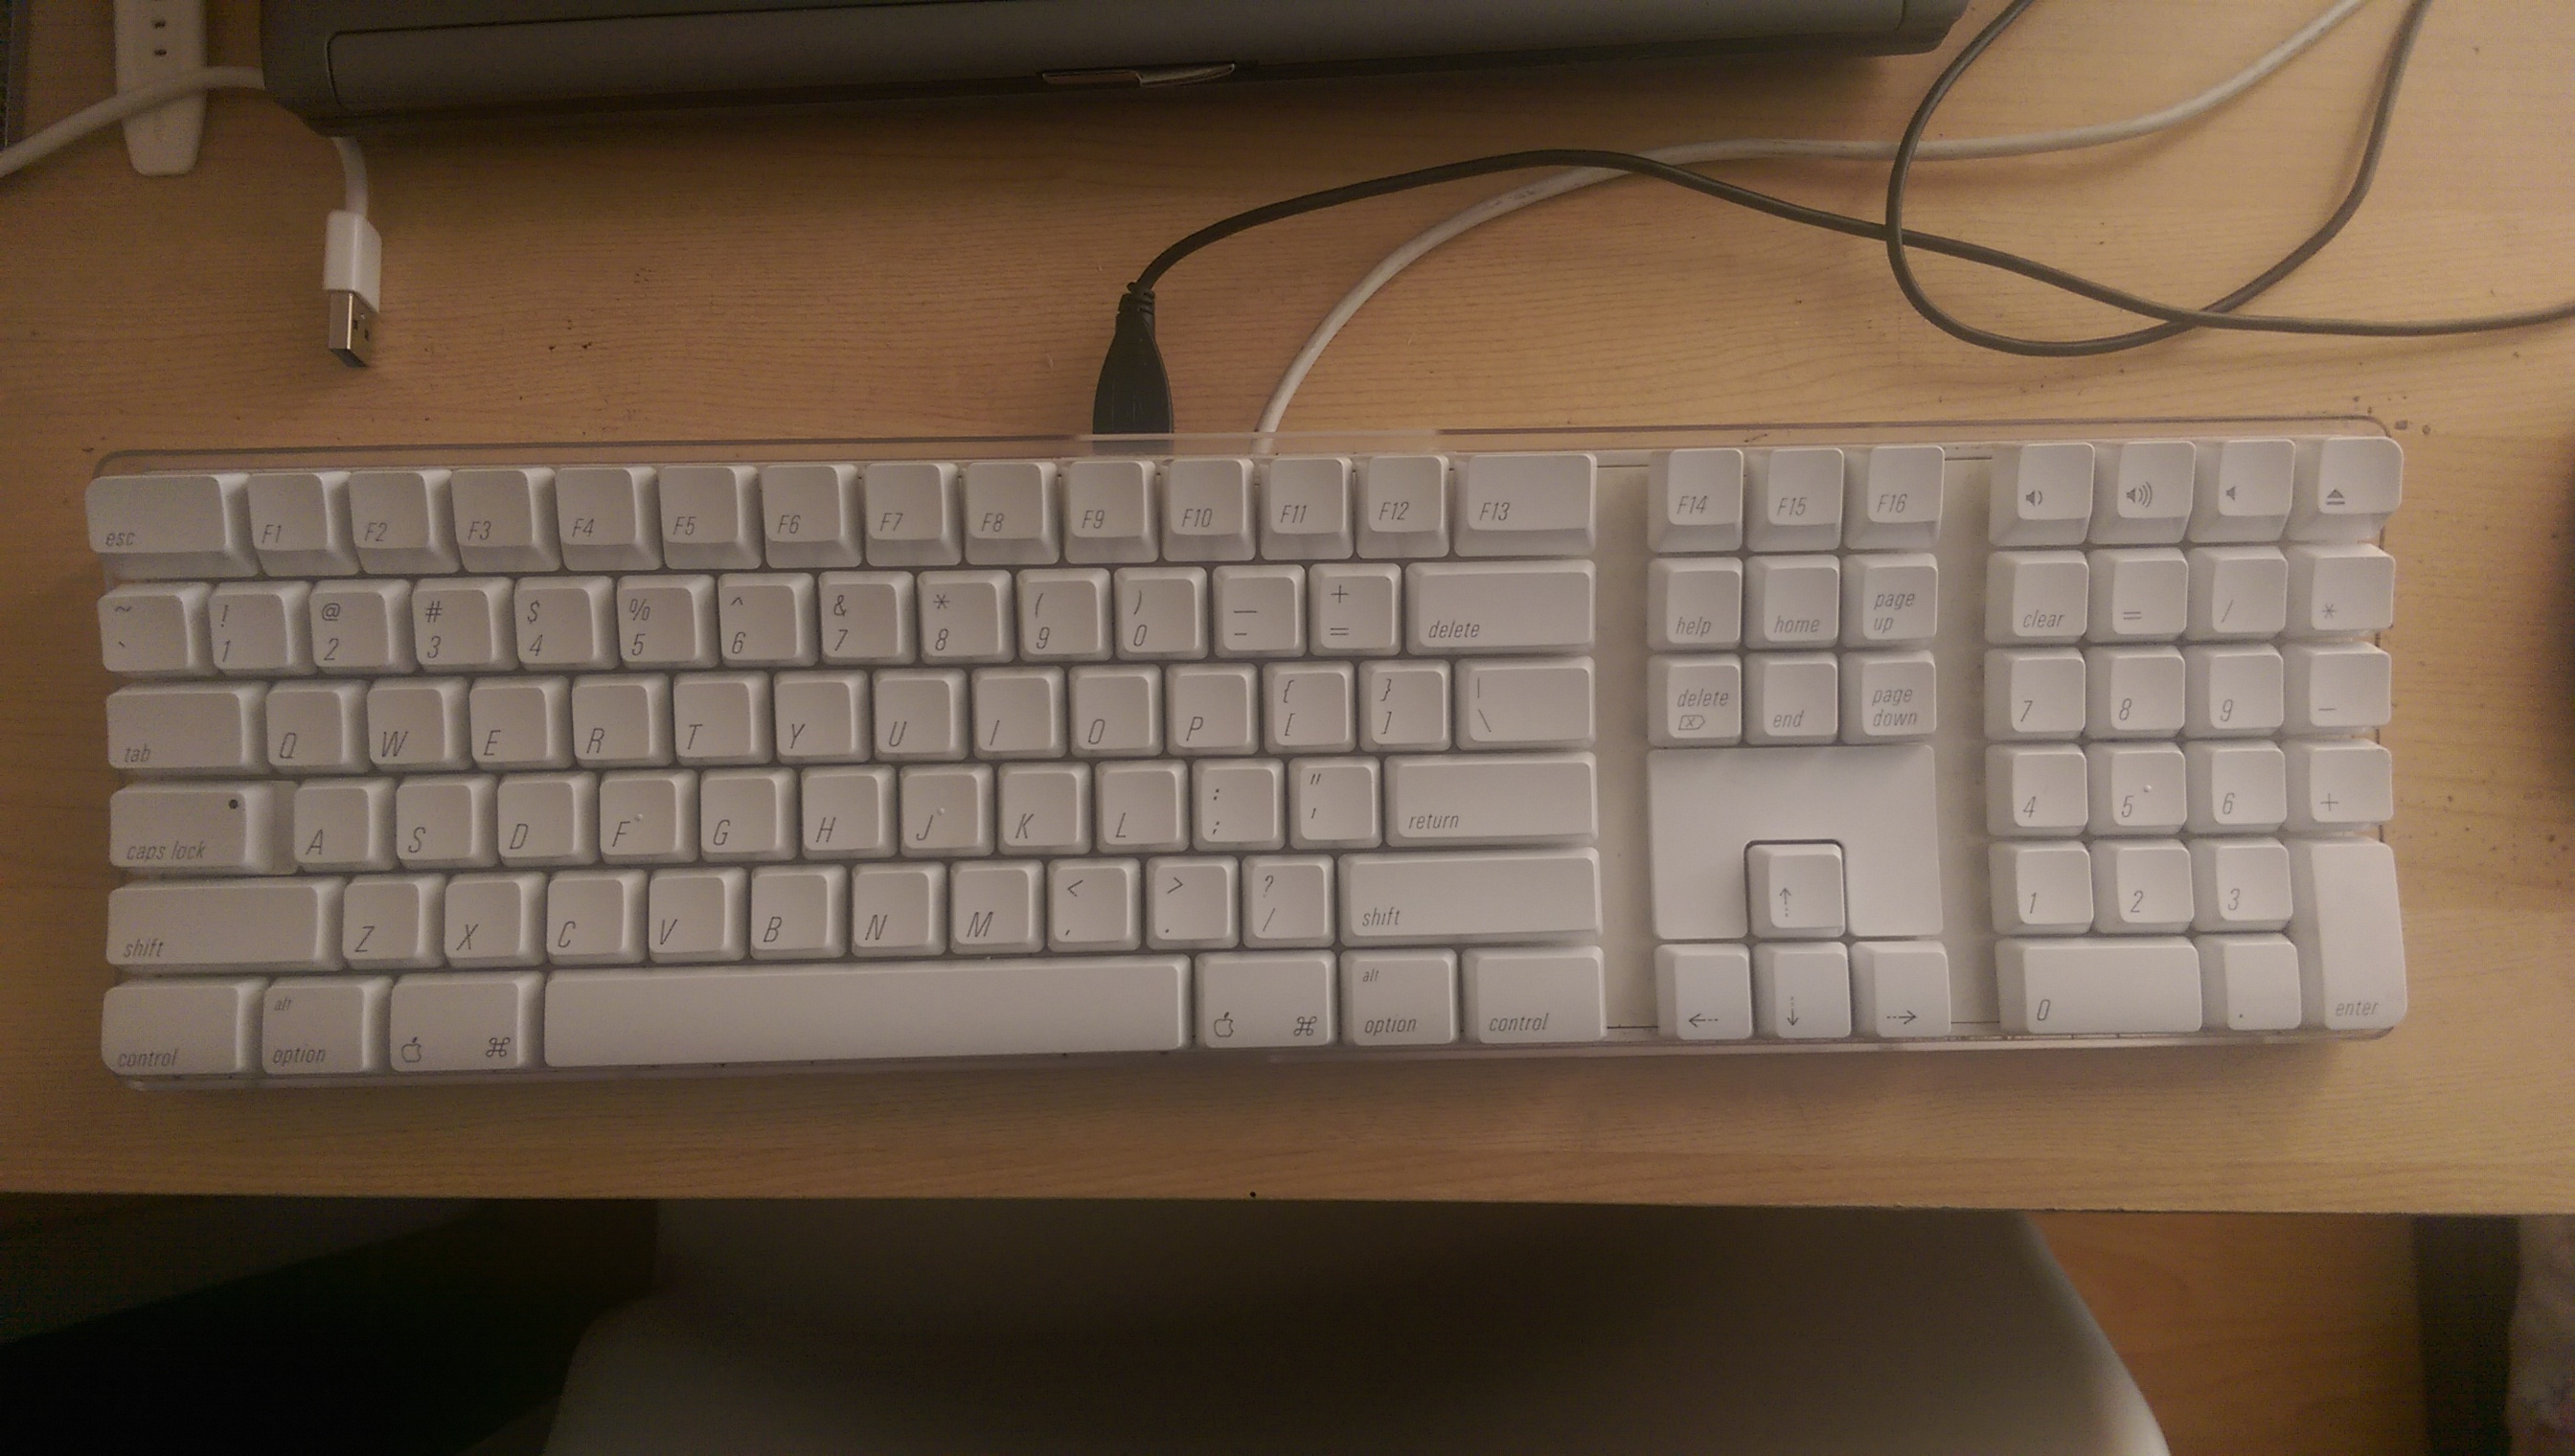 Apple usb keyboard m2452 driver for windows 7